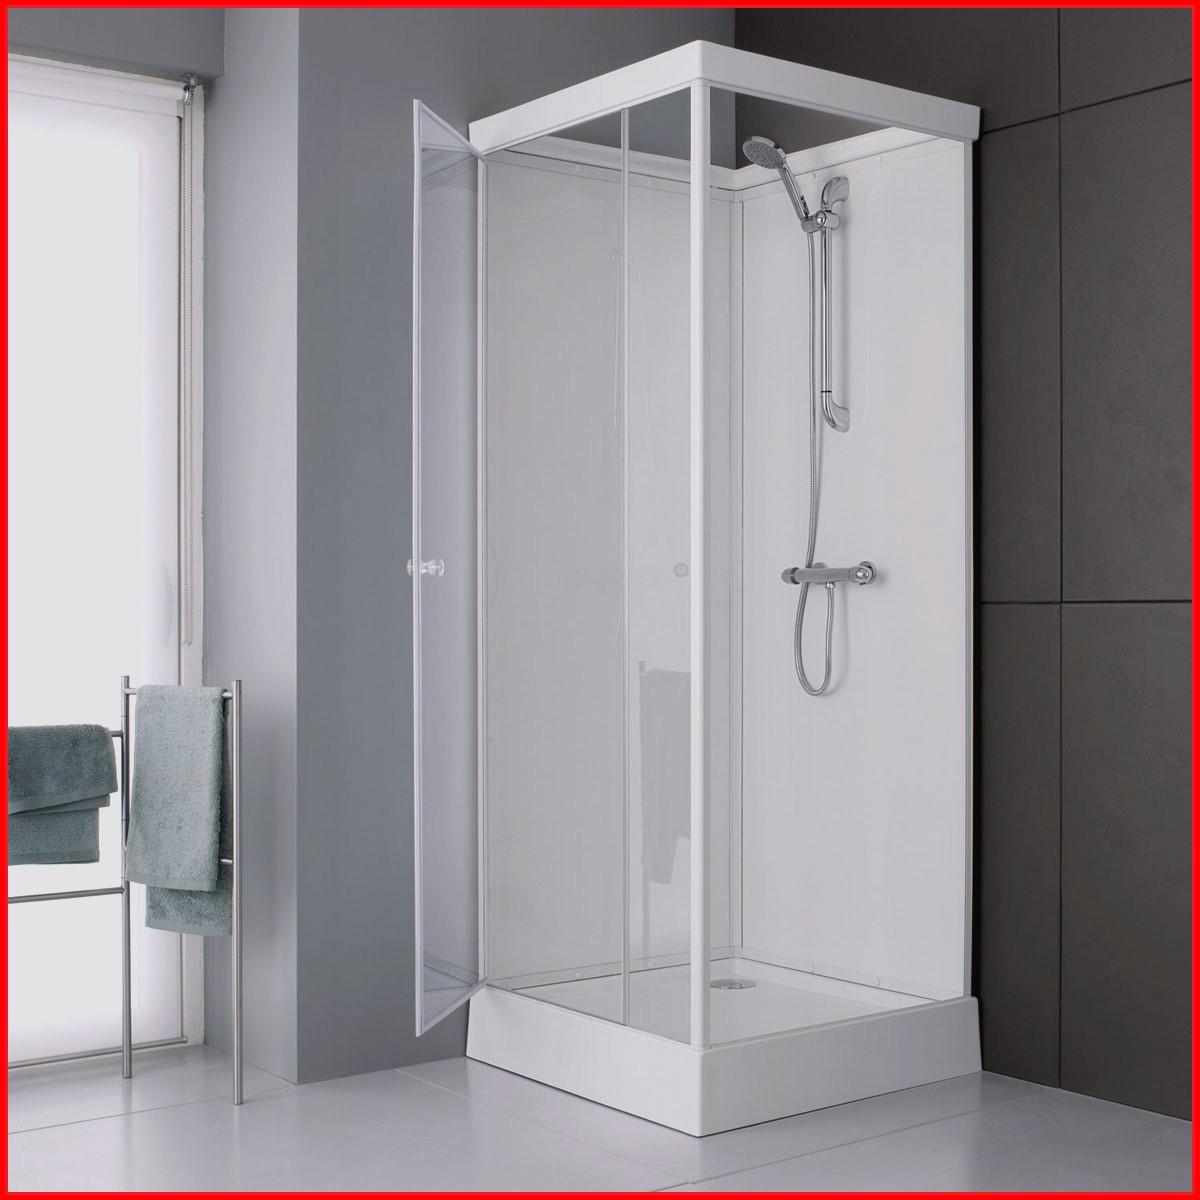 cabine douche complete pas cher